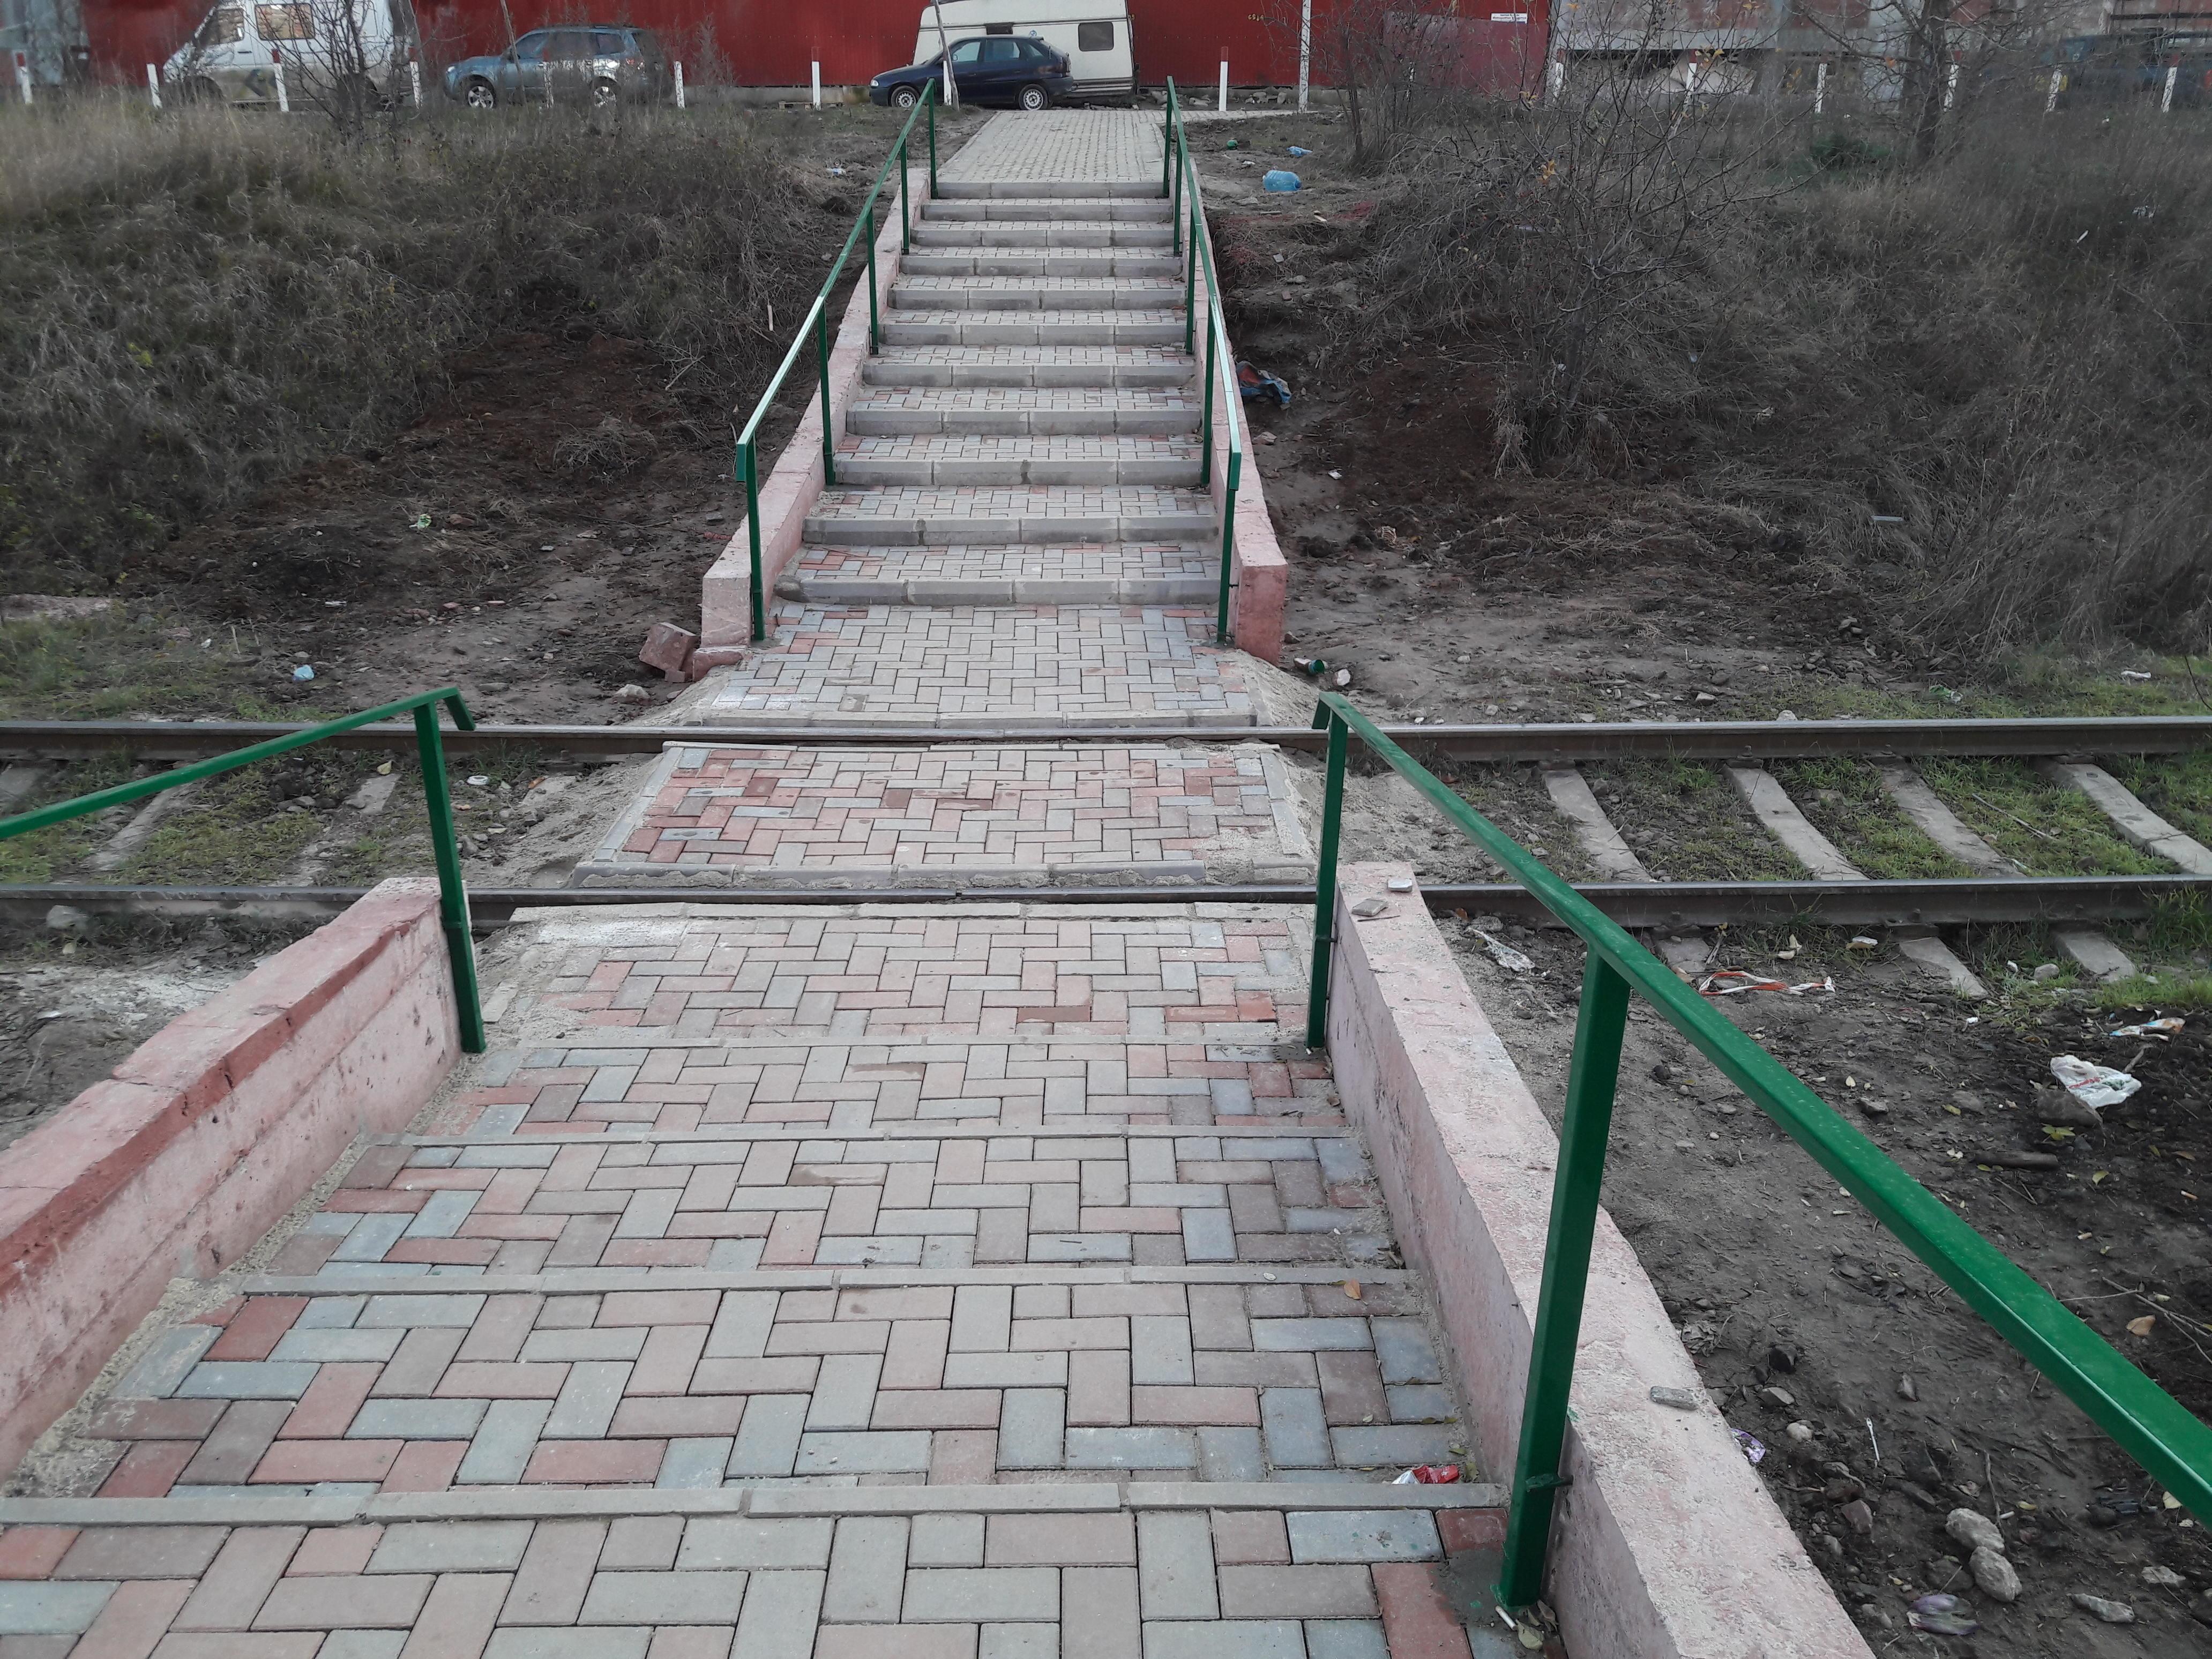 Linii industriale in Bucuresti! Bfi1513182845i